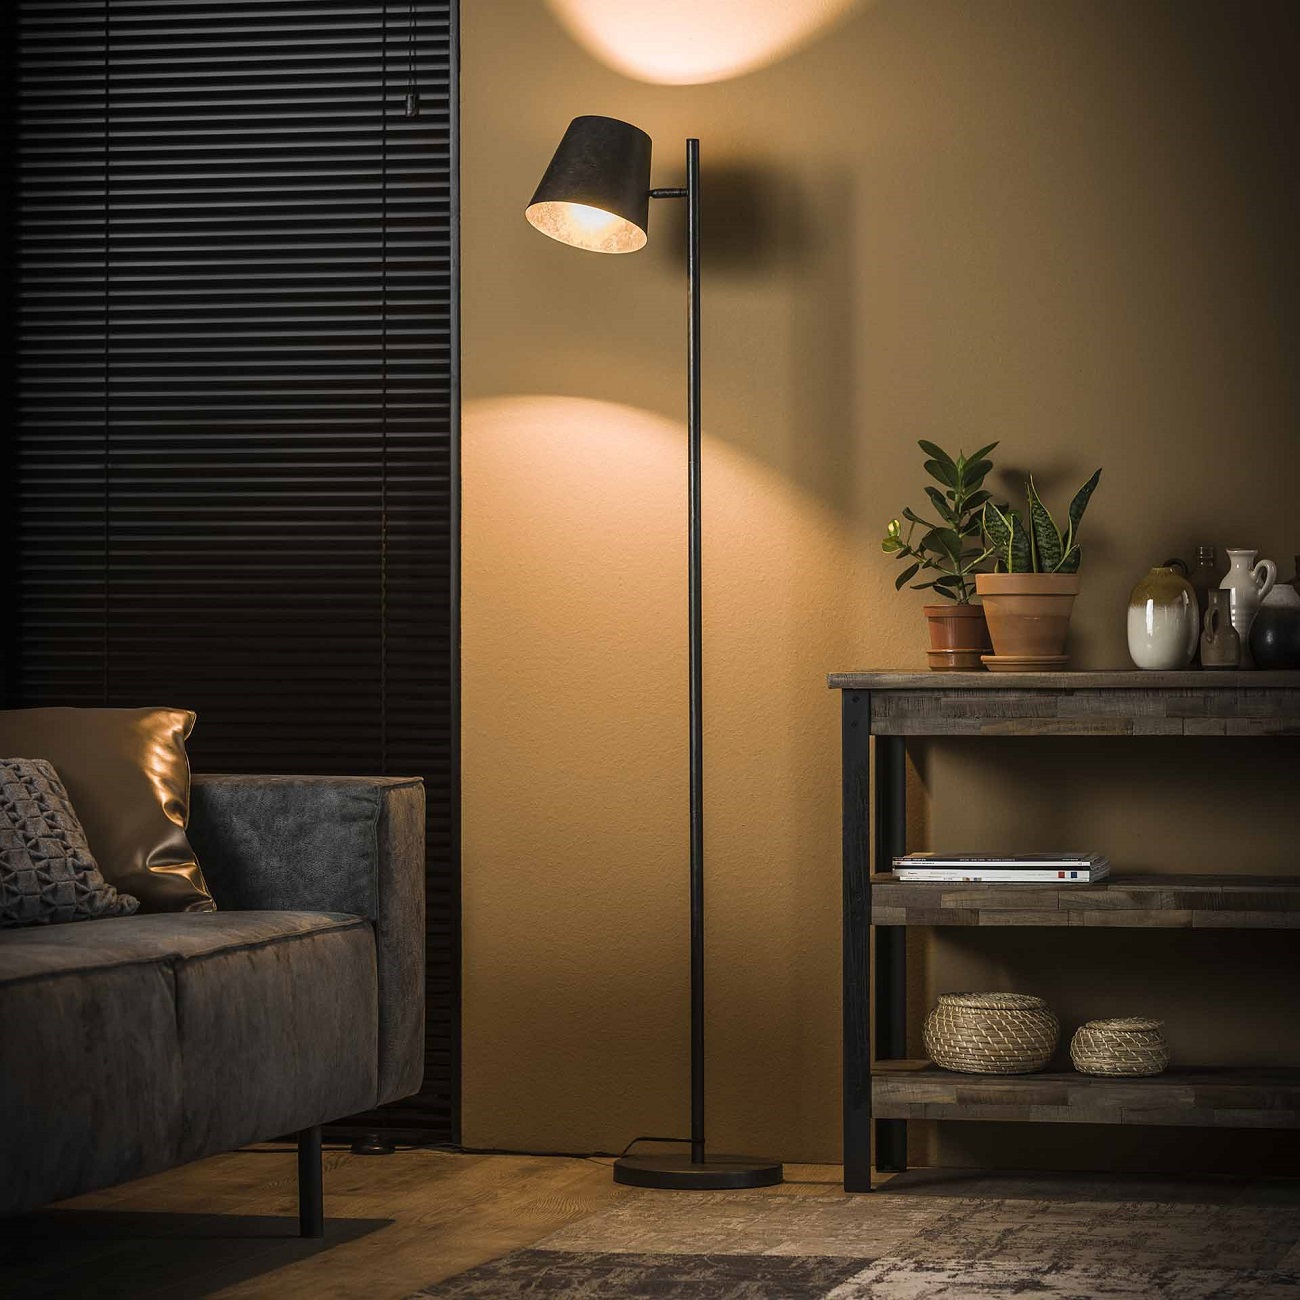 Vloerlamp Class 157 cm hoog in Charcoal